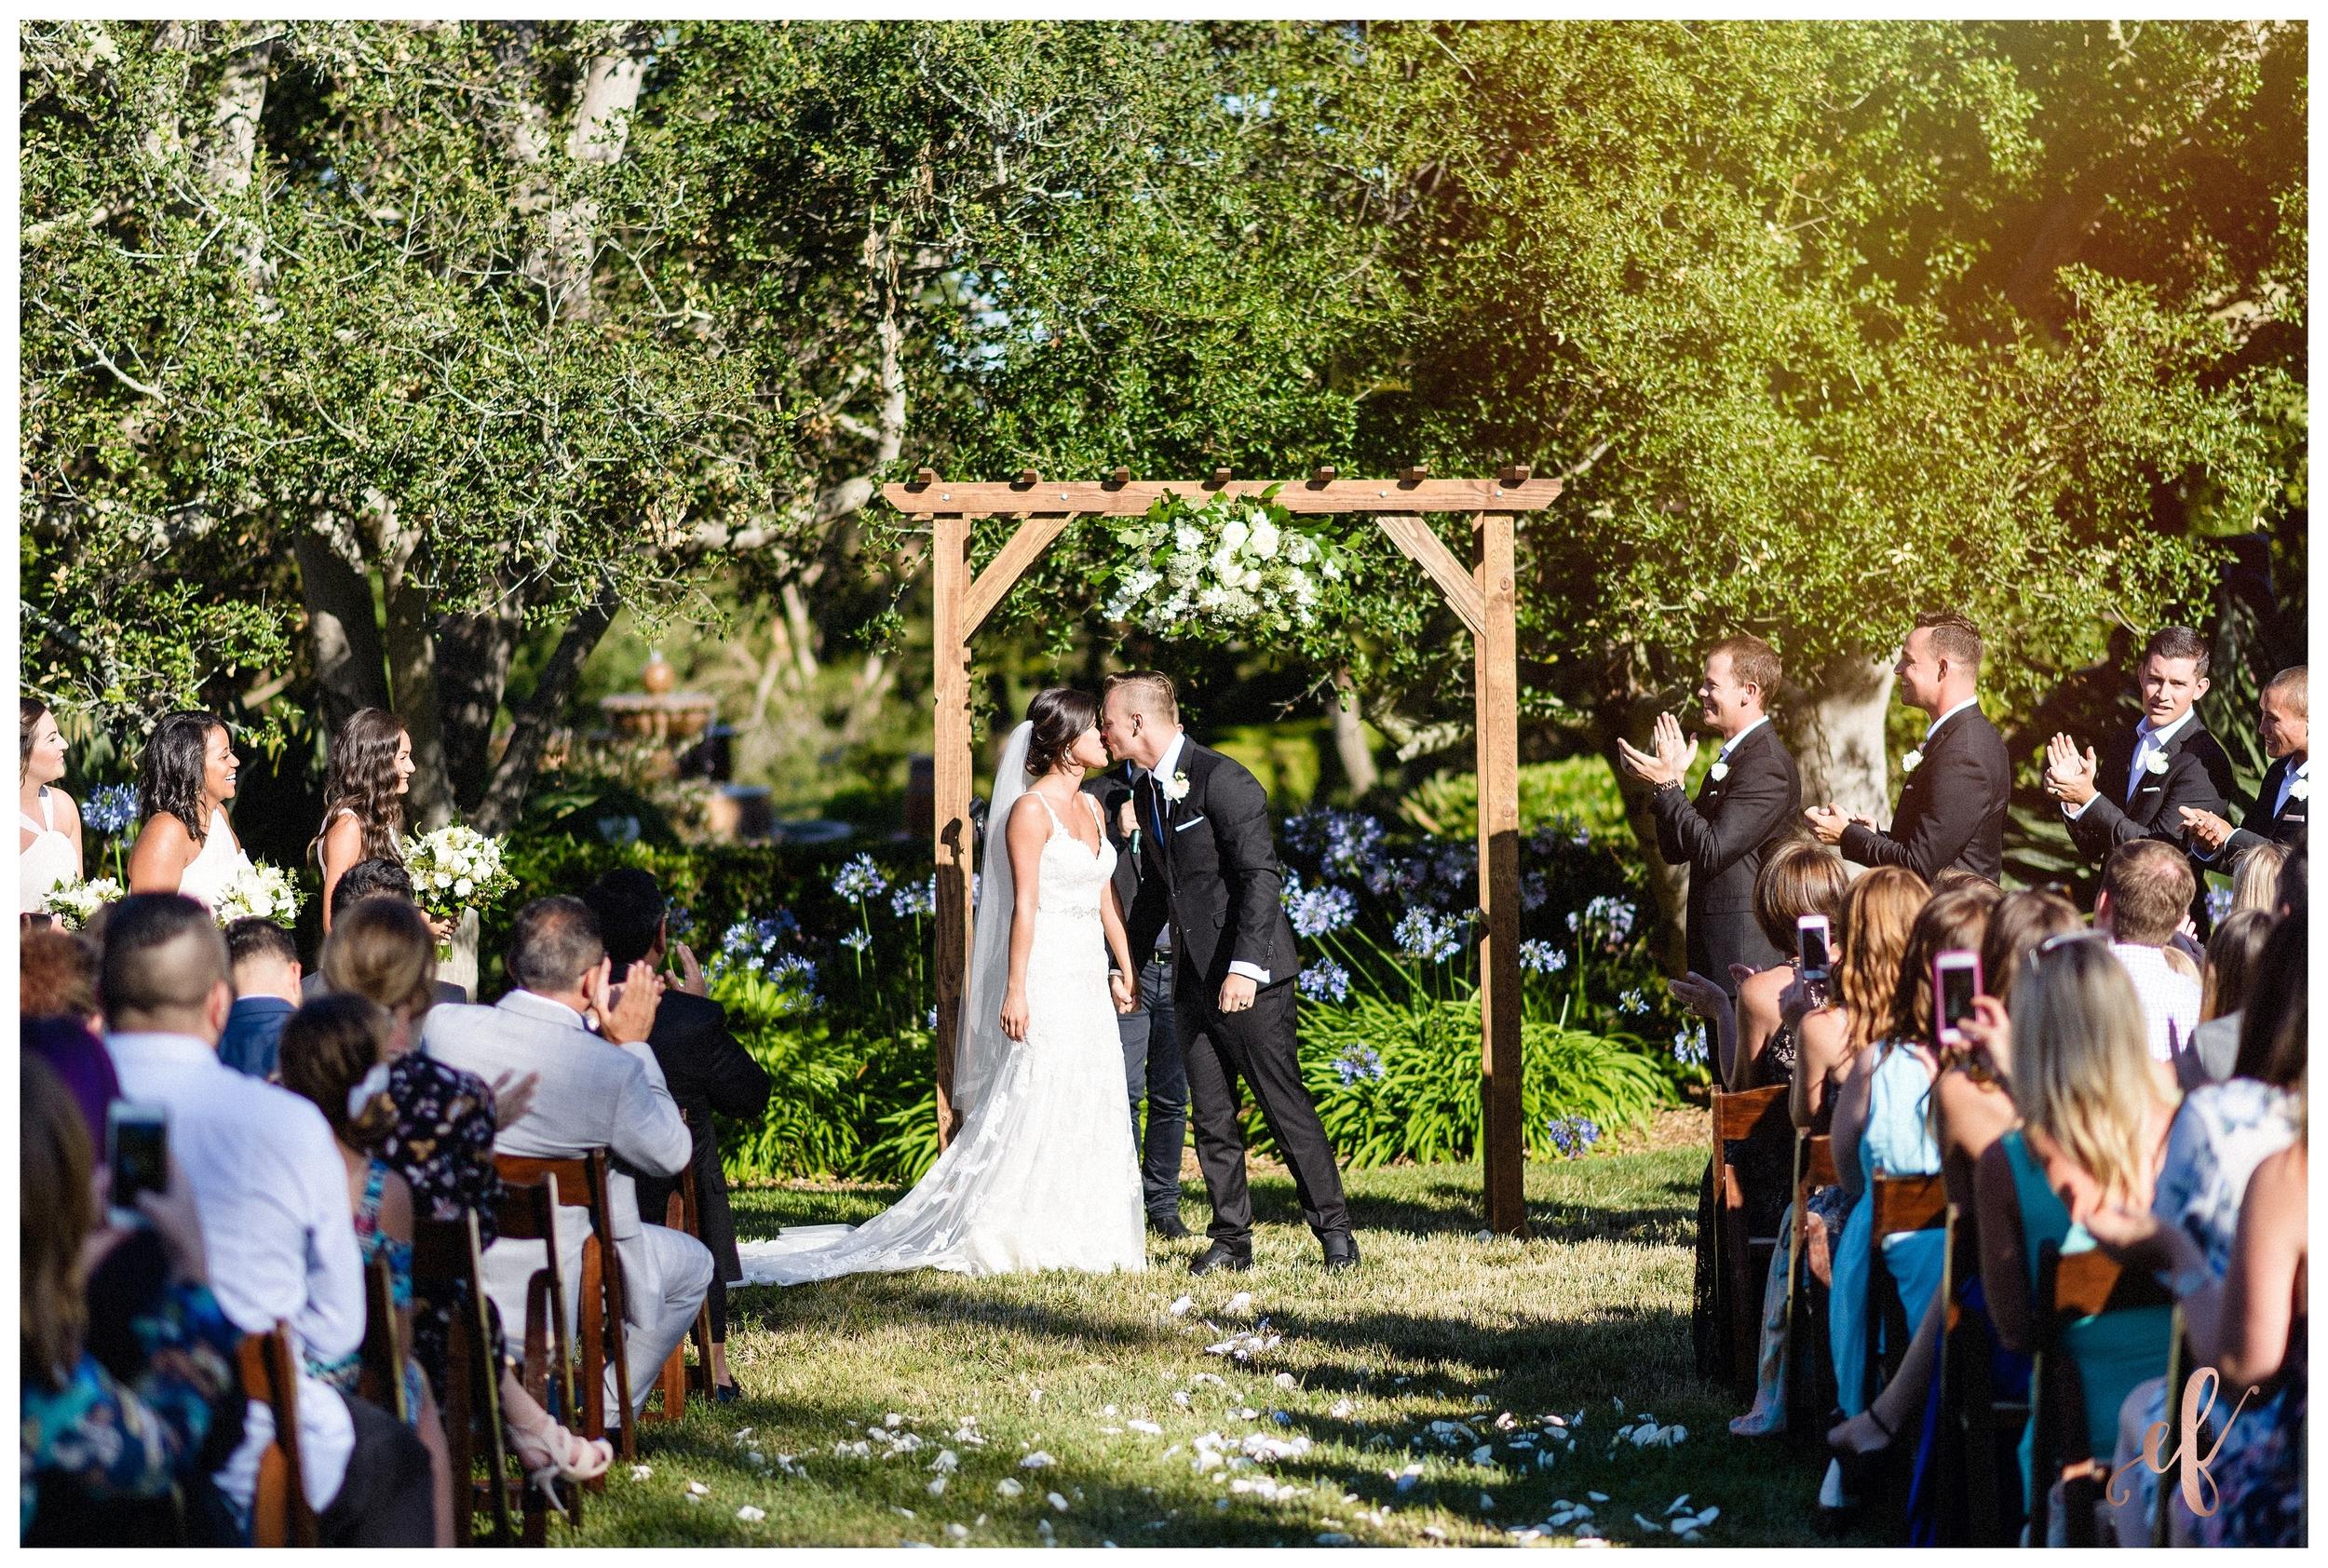 San Diego Wedding Photographer   Ernie & Fiona Photography   Bride   Groom   First Kiss